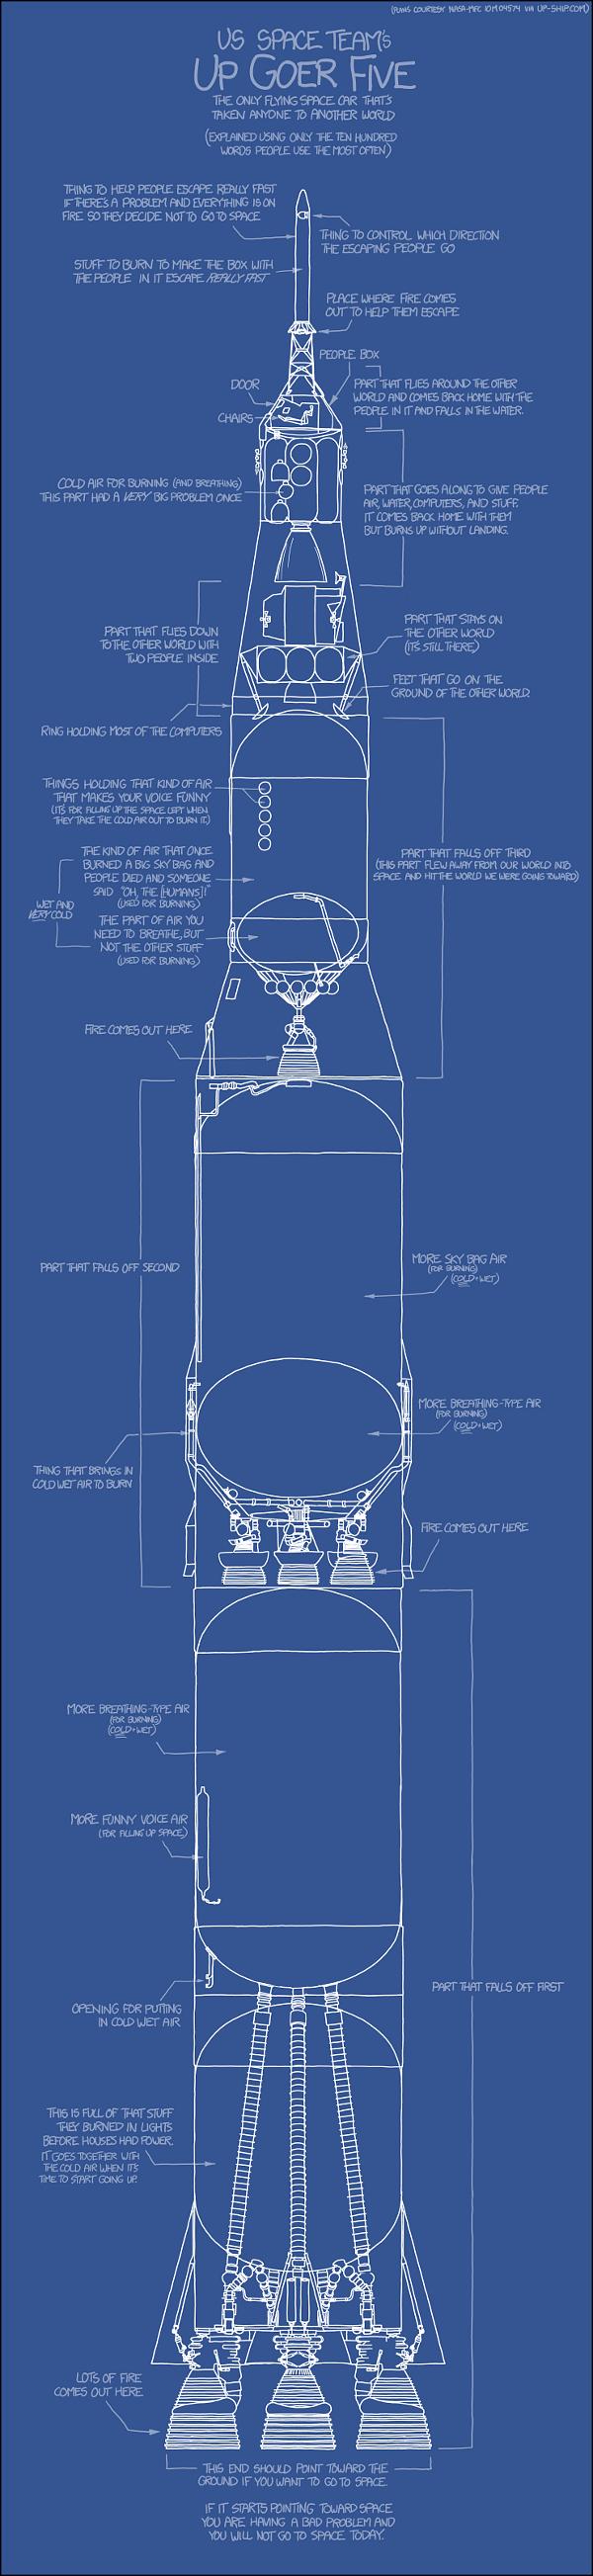 XKCD's Saturn V Post